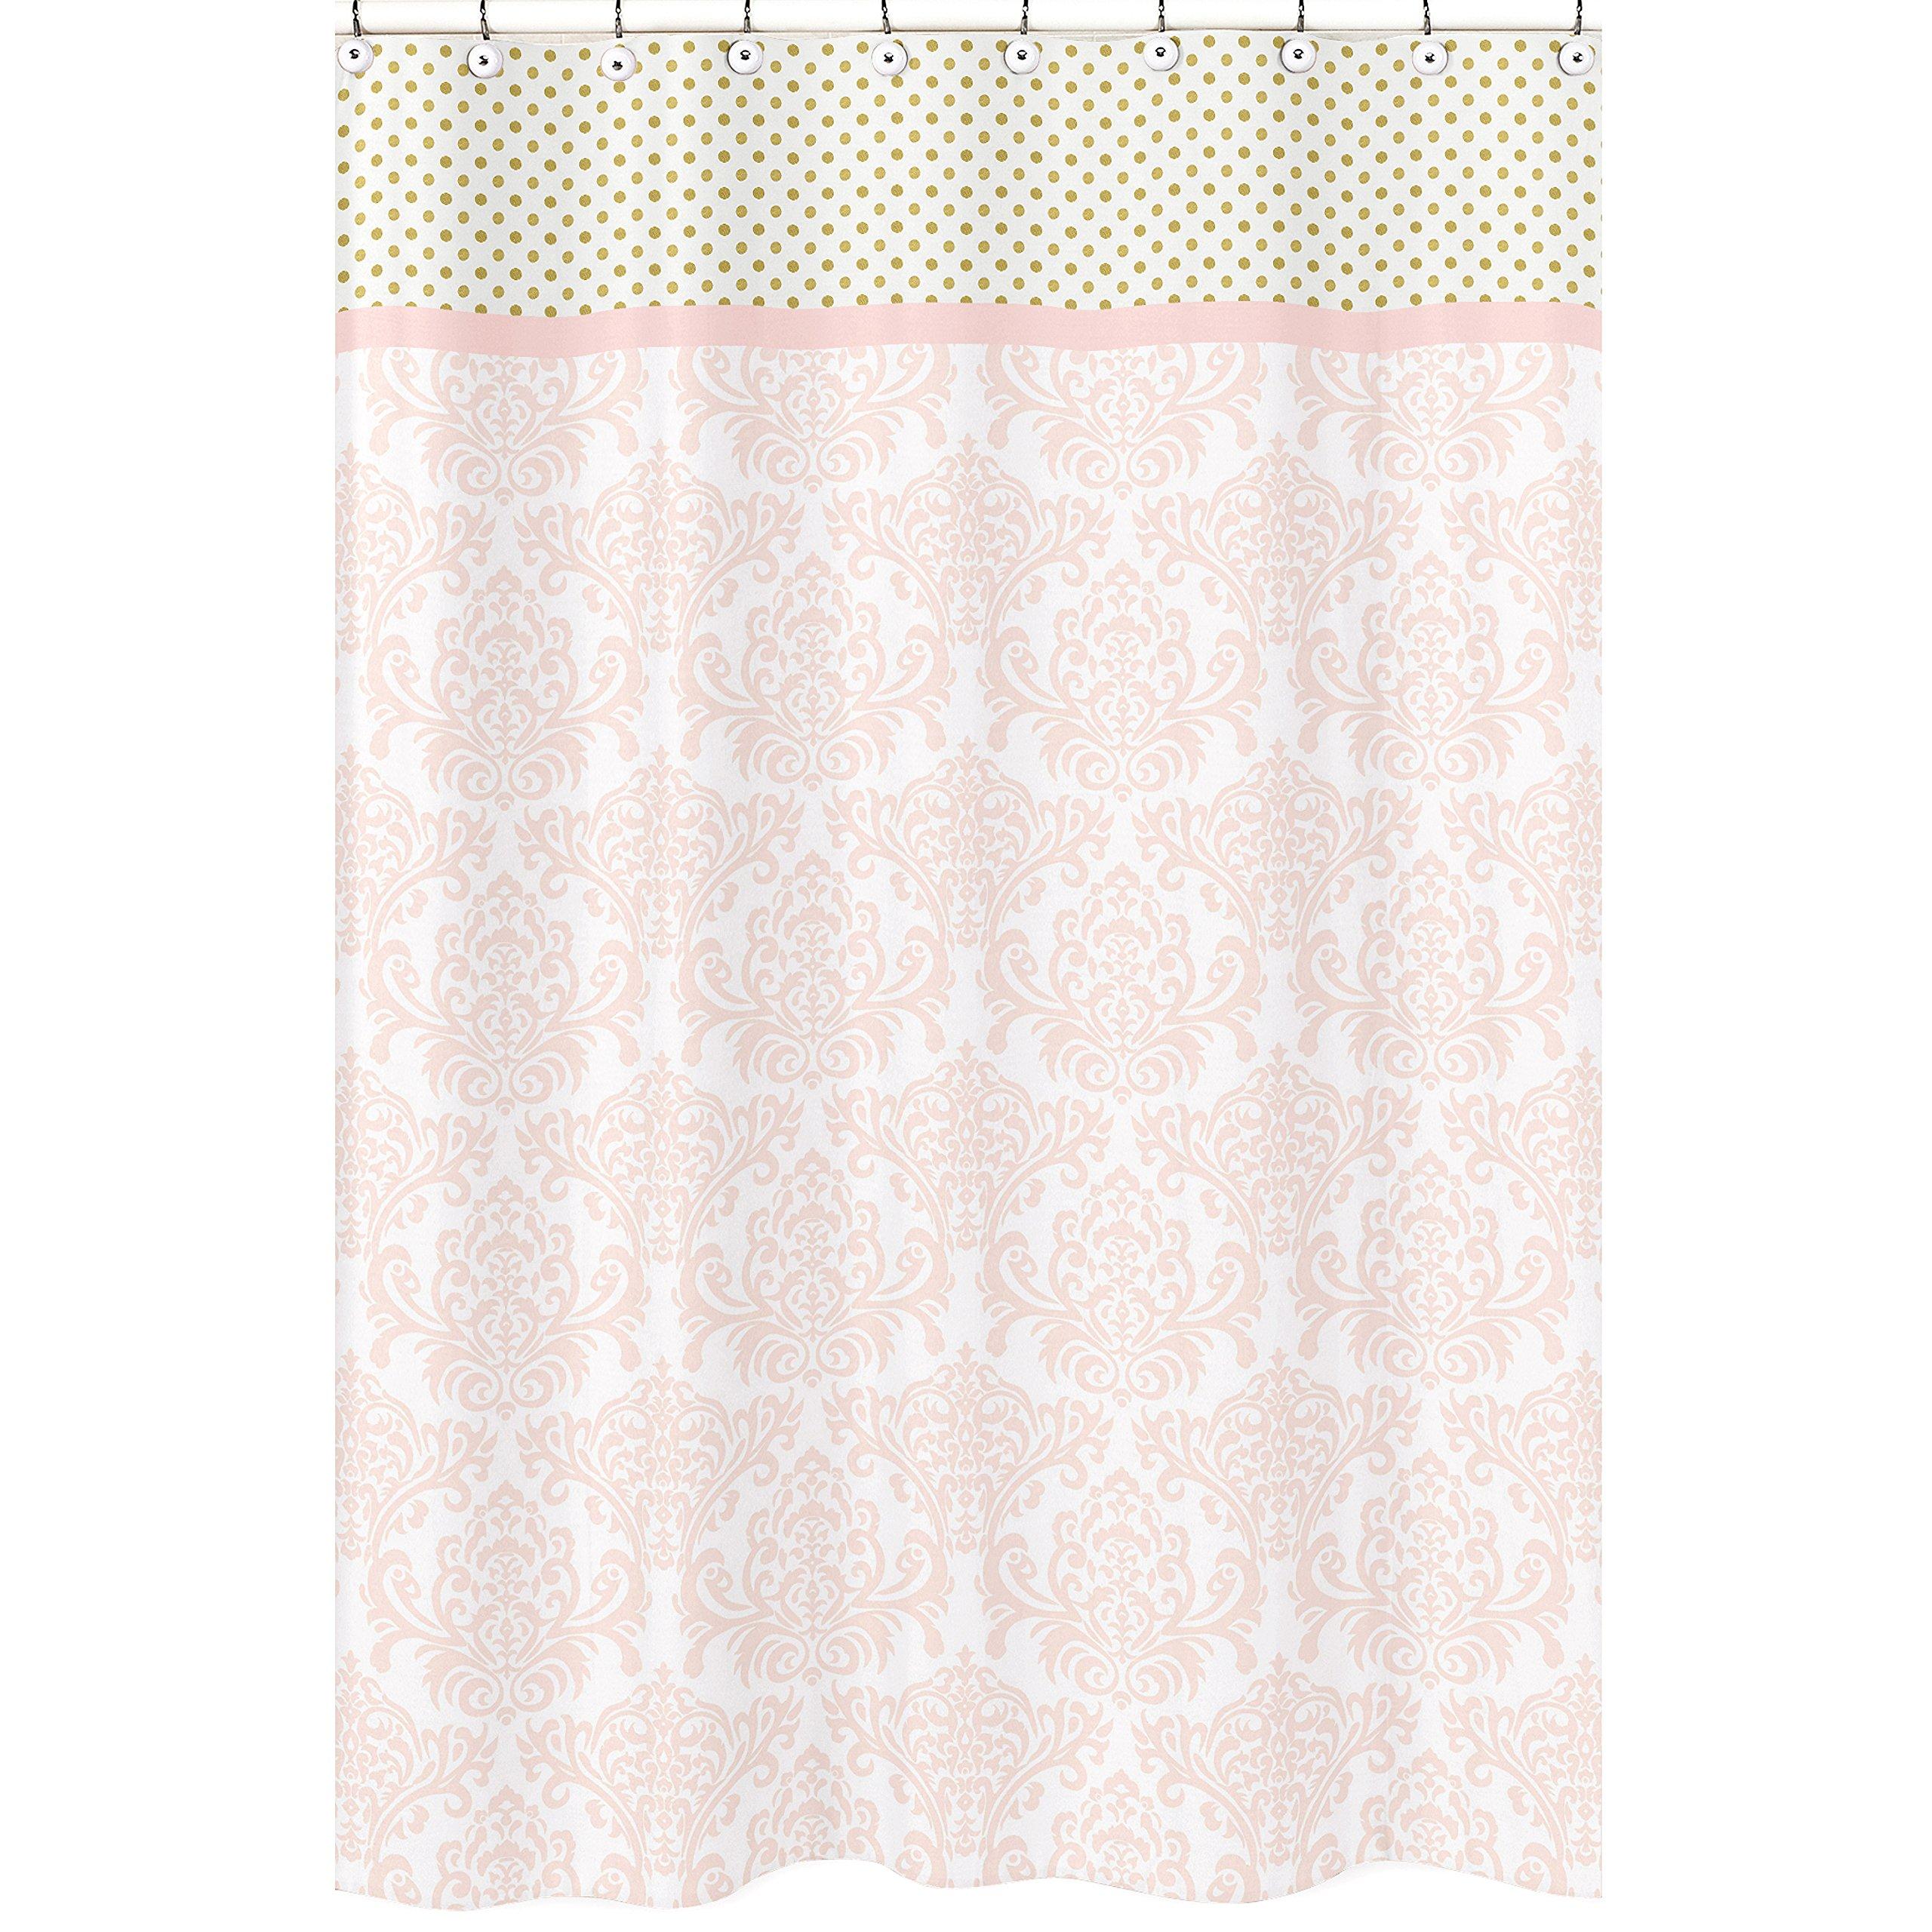 Sweet Jojo Designs Blush Pink White Damask and Gold Polka Dot Amelia Girls Kids Bathroom Fabric Bath Shower Curtain